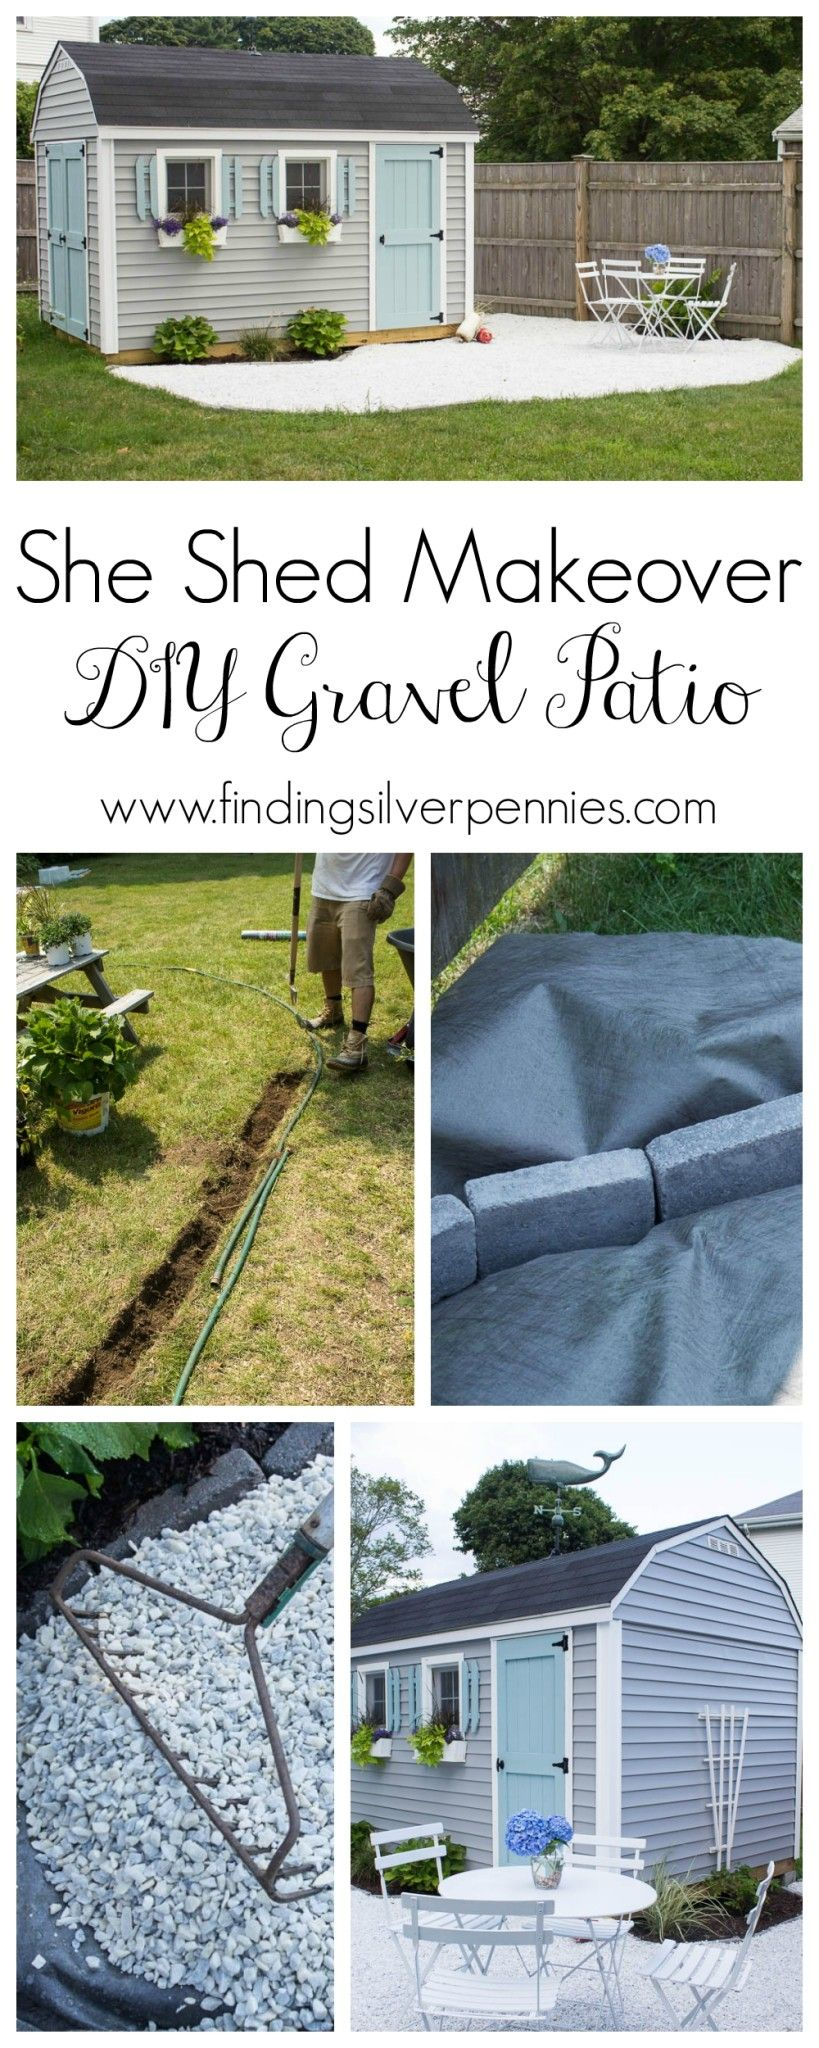 She shed diy gravel patio backyard ideas pinterest for Amenagement jardin diy